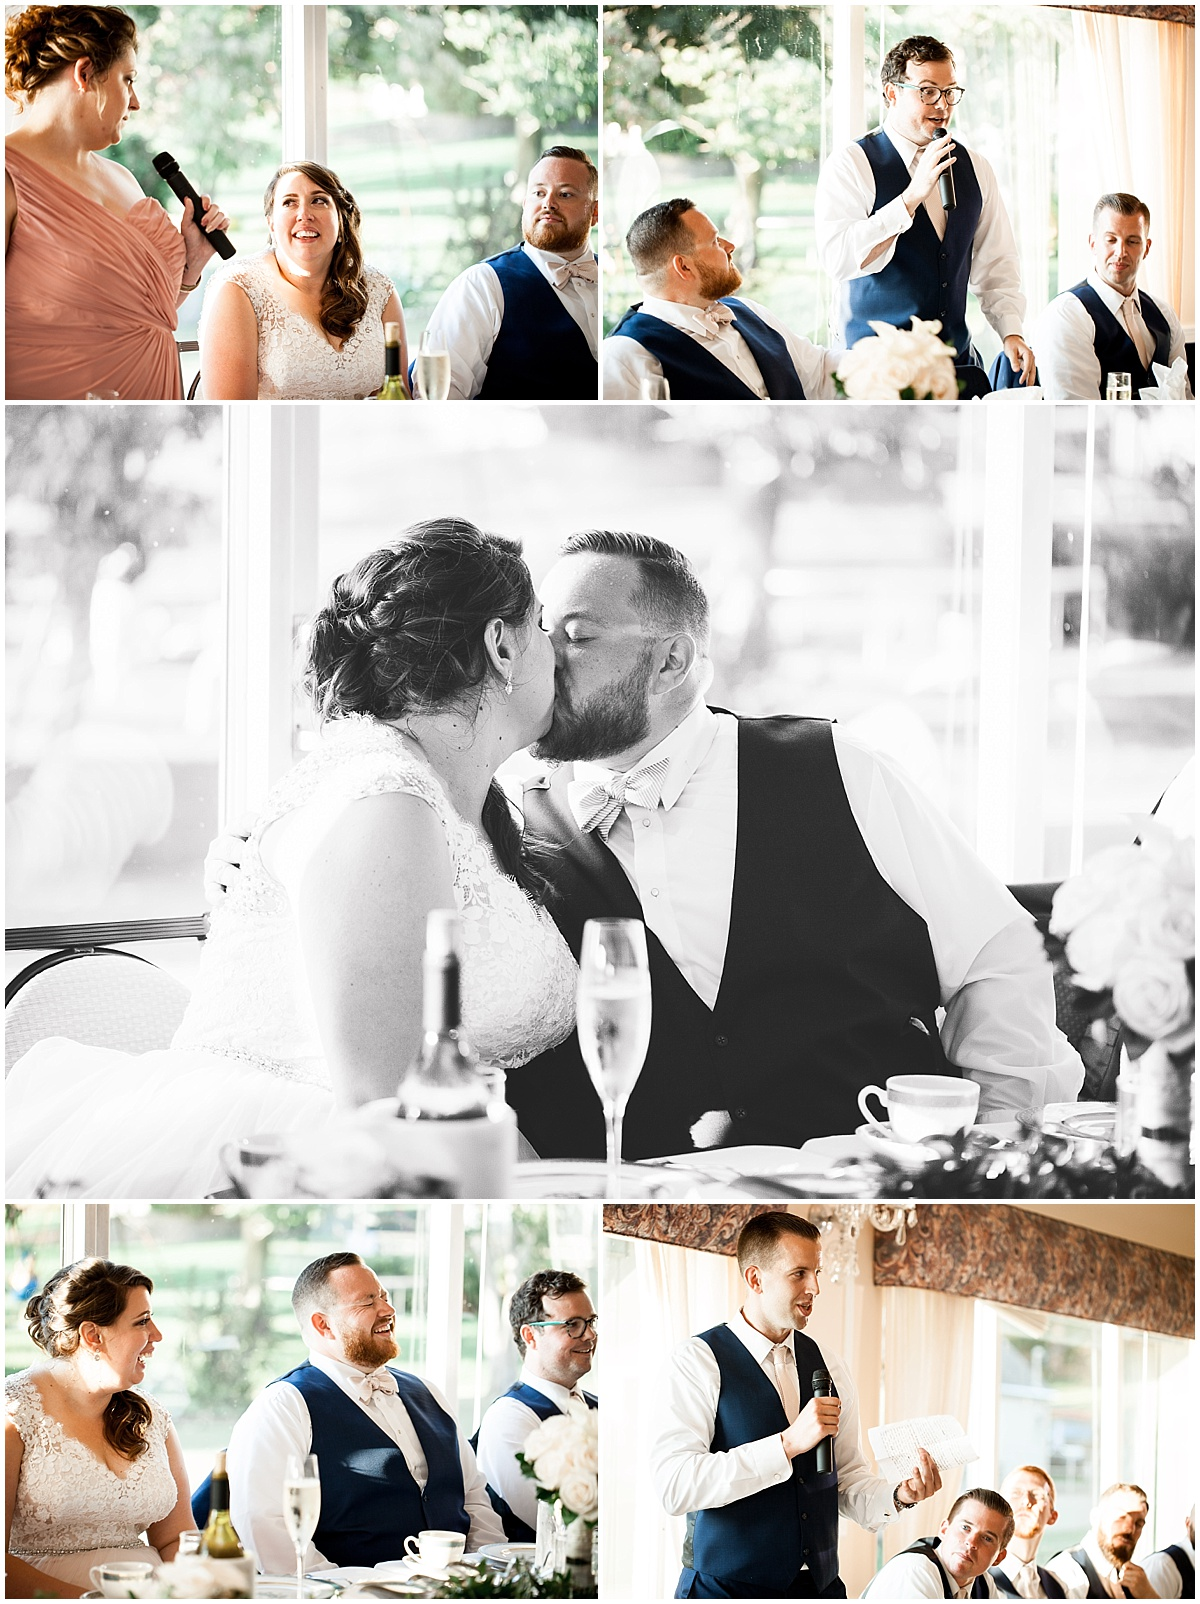 wedding toasts erie pa wedding photographer